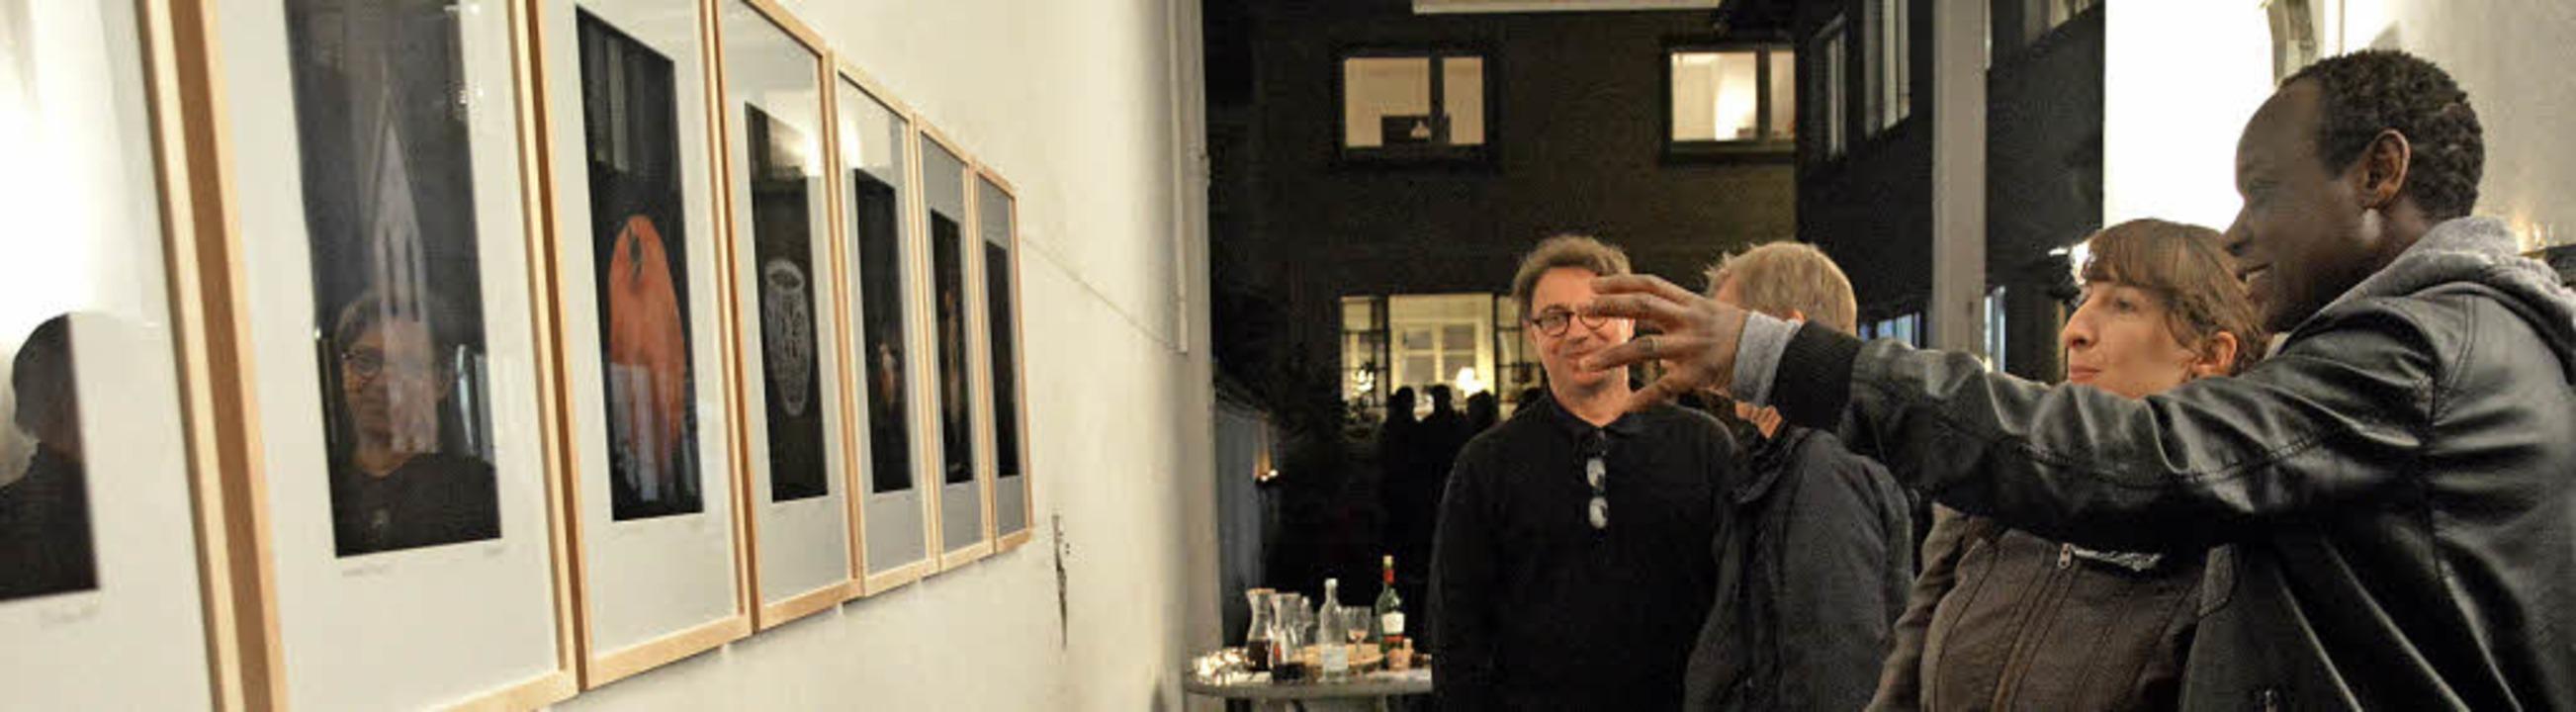 Robby Walters Fotografien faszinierten...en Künstlerin ins Auge (rechtes Bild).    Foto: Barbara Ruda